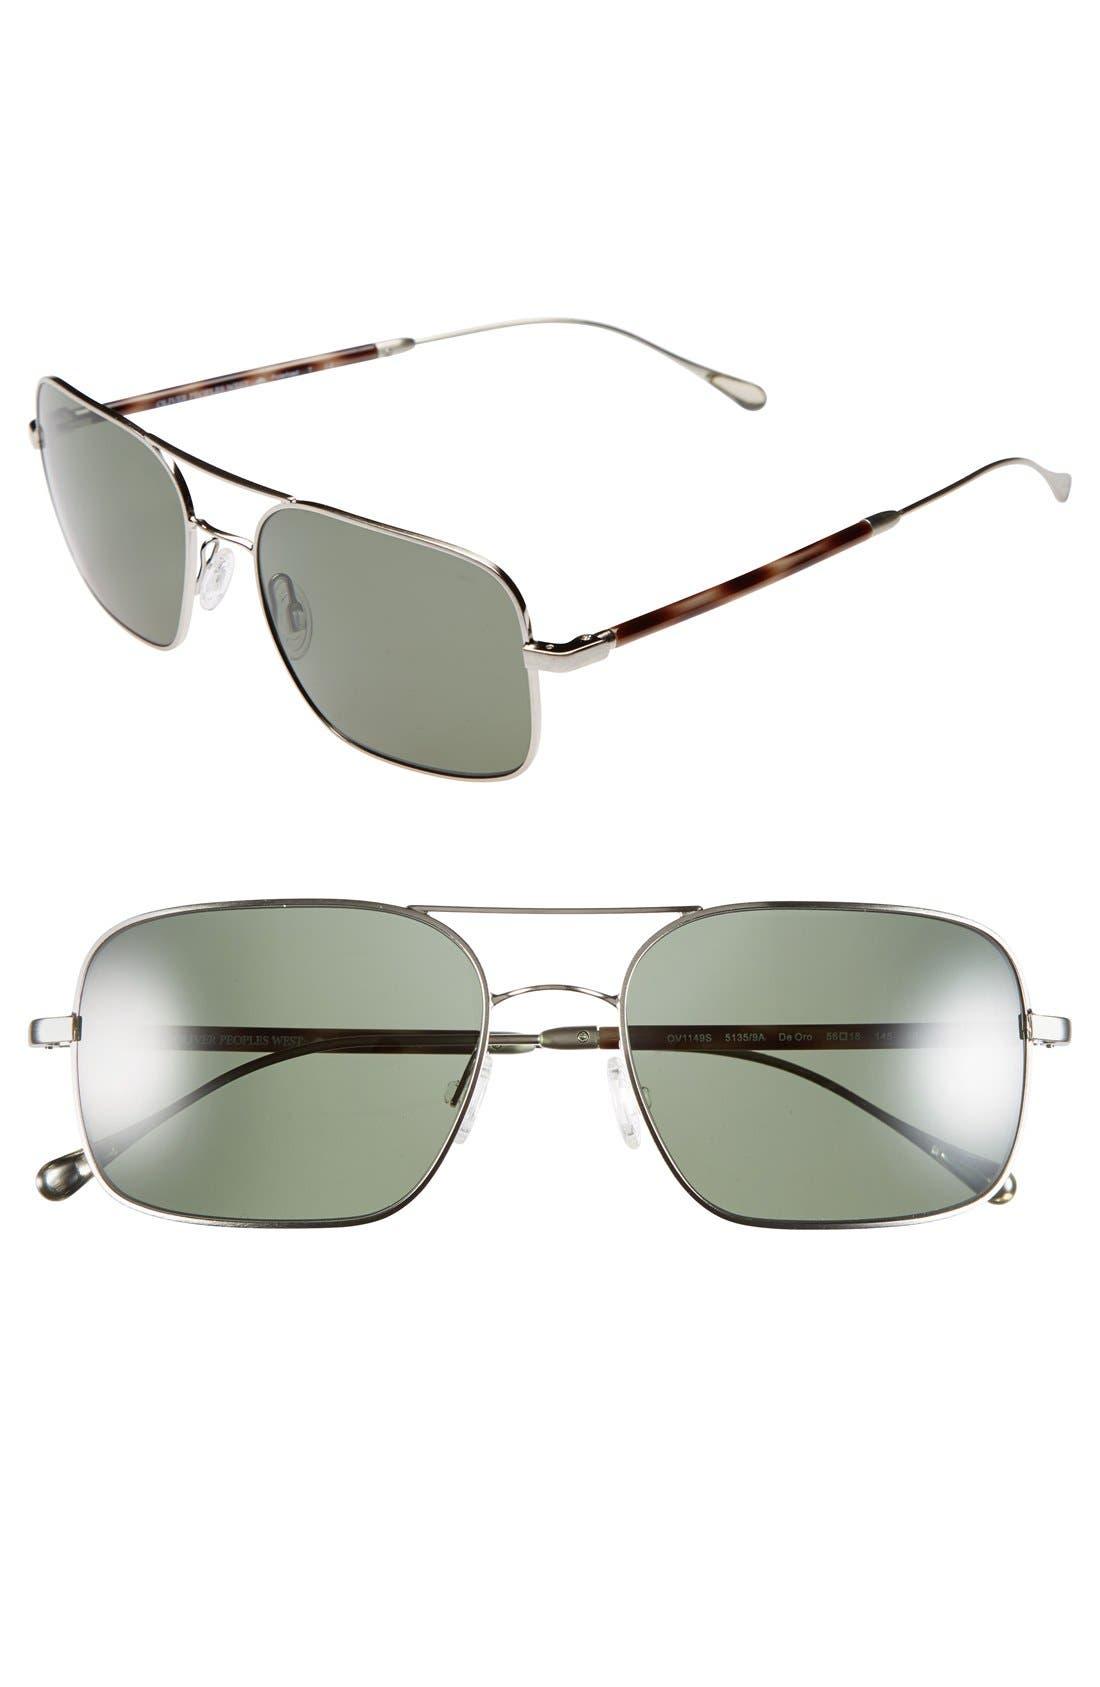 Main Image - Oliver Peoples West 'De Oro' 56mm Polarized Metal Aviator Sunglasses